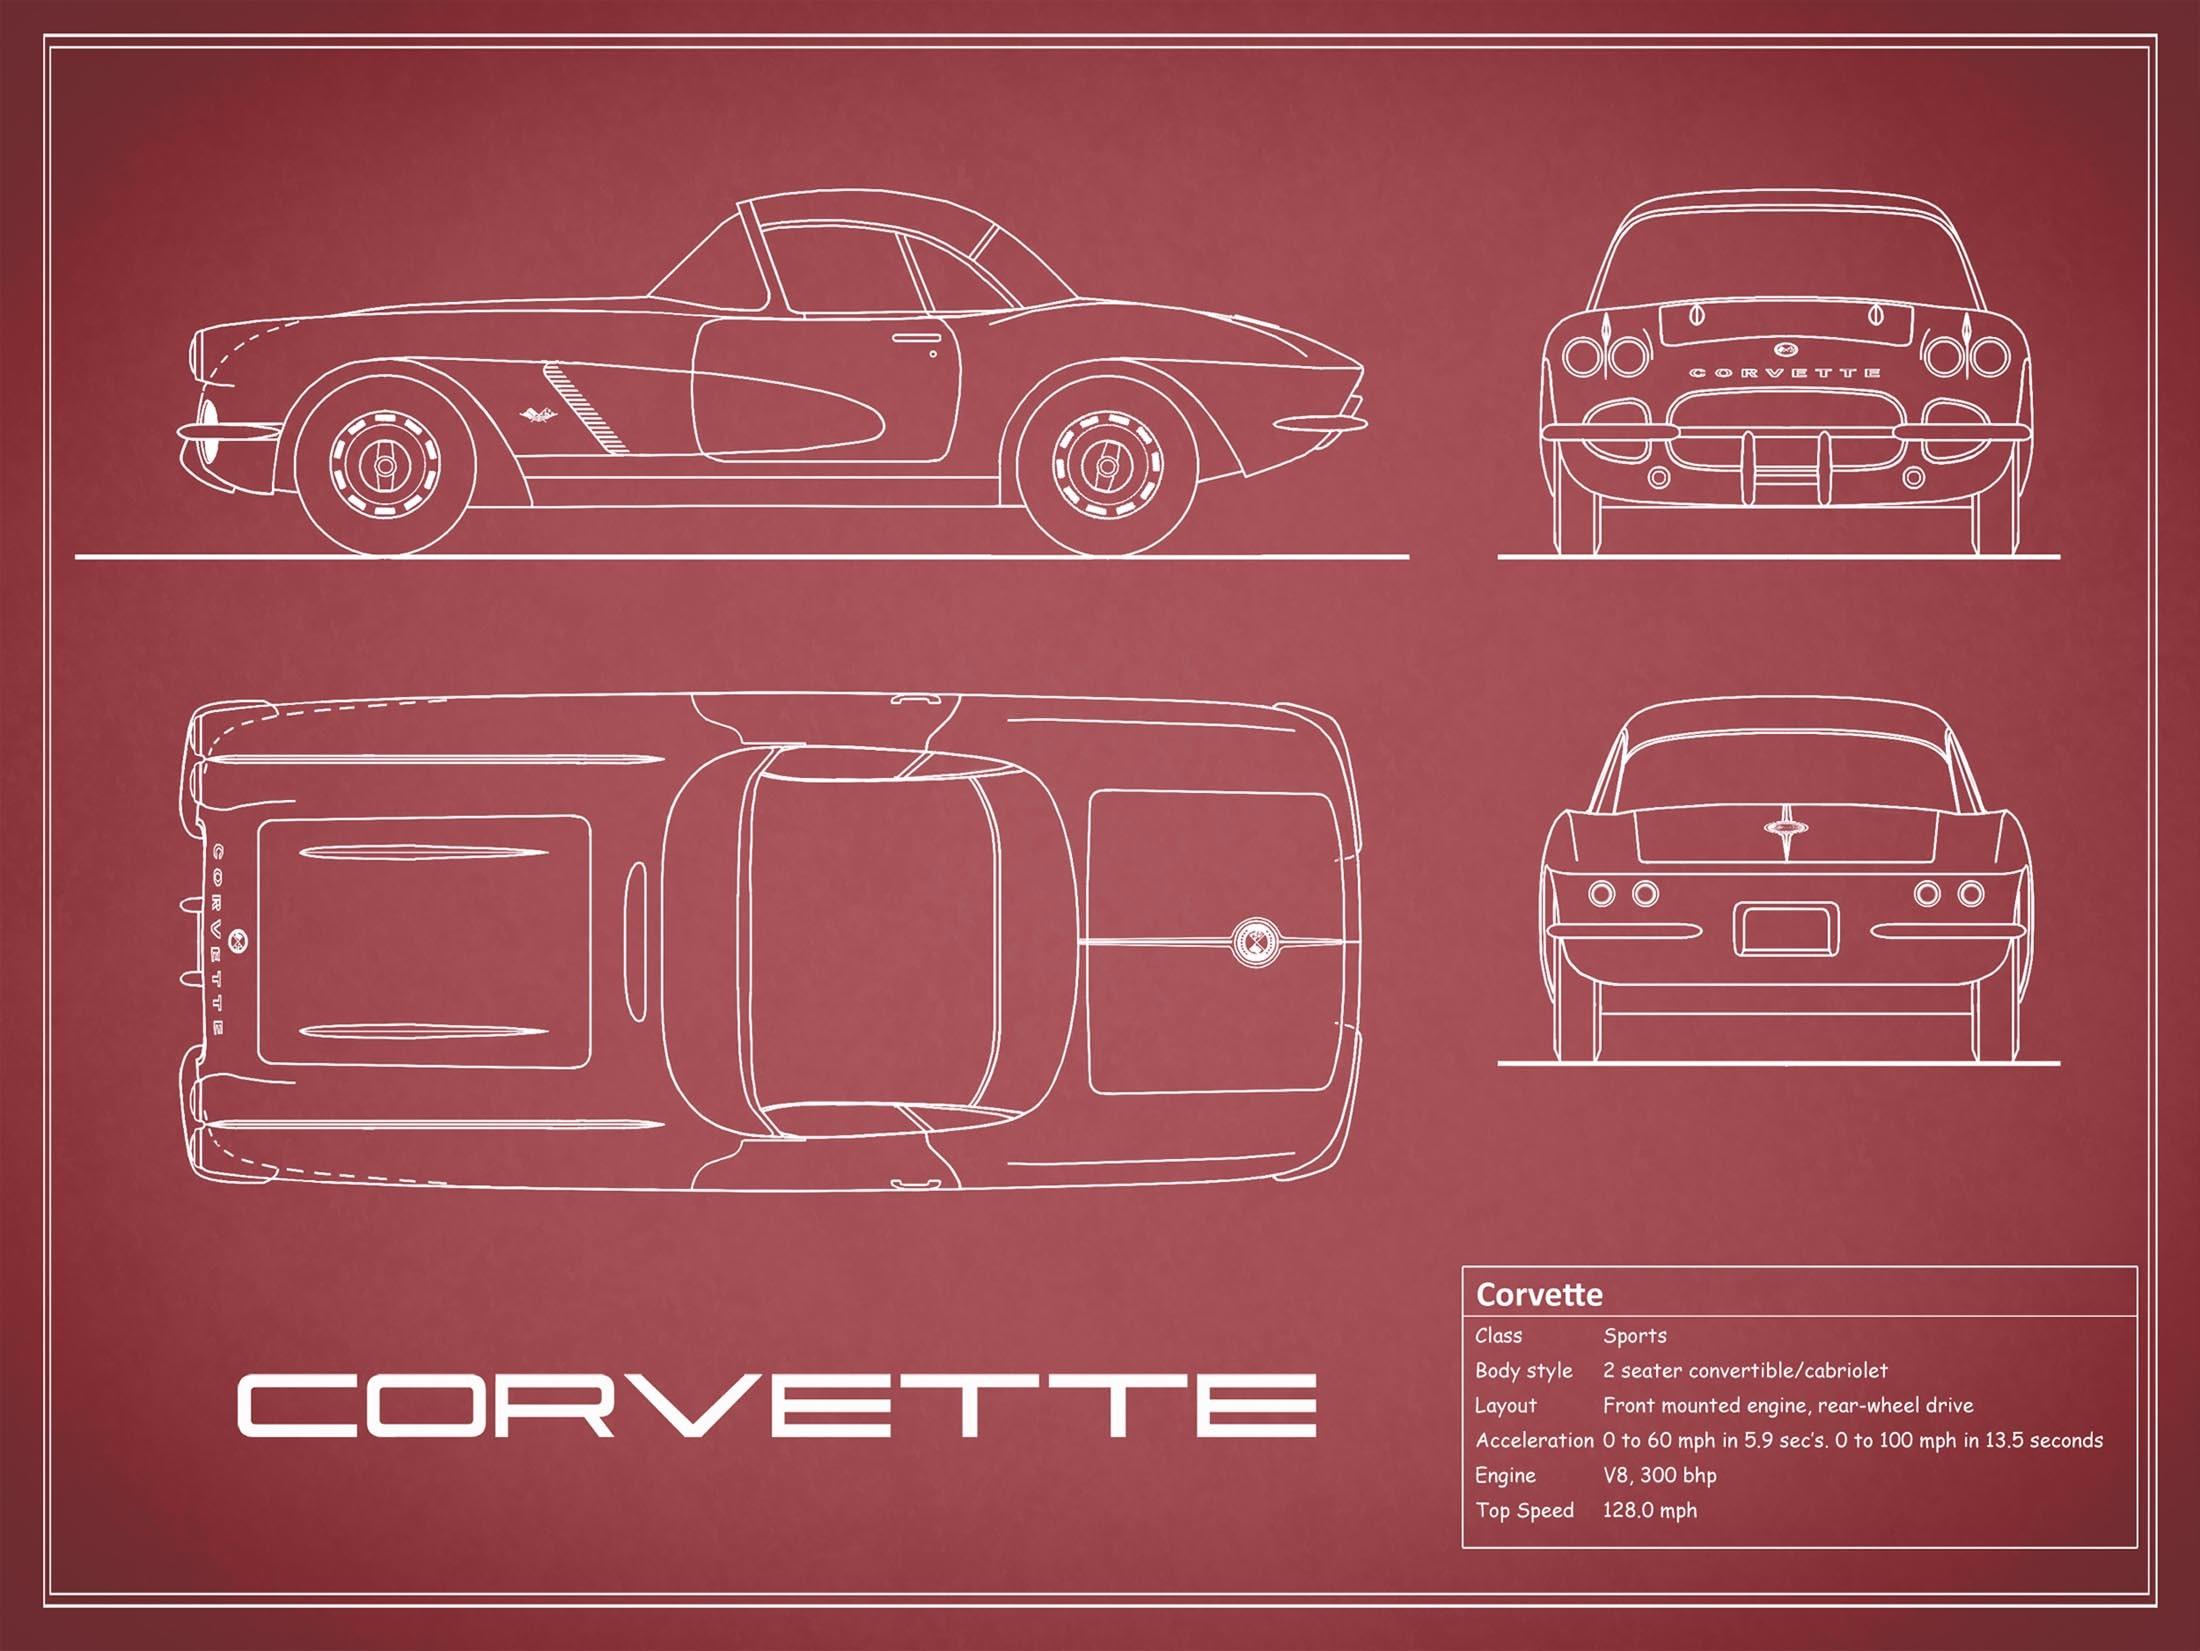 Corvette - Red